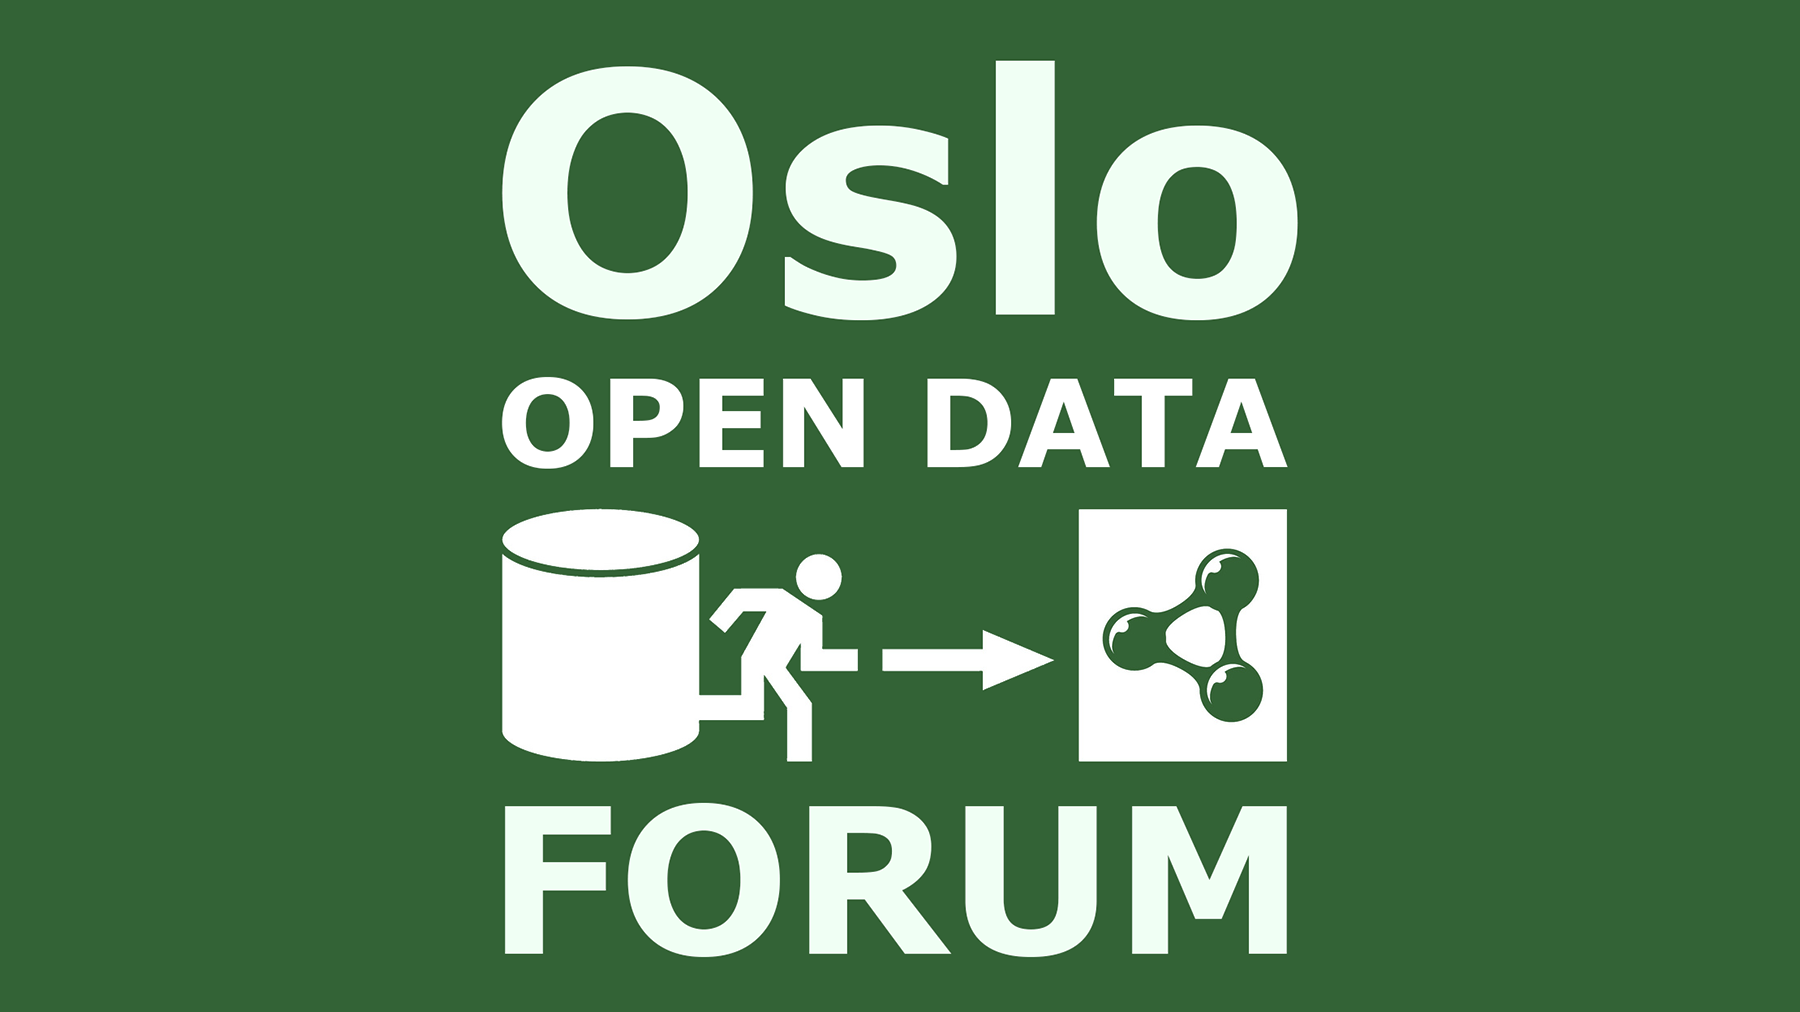 Oslo Open Data Forum